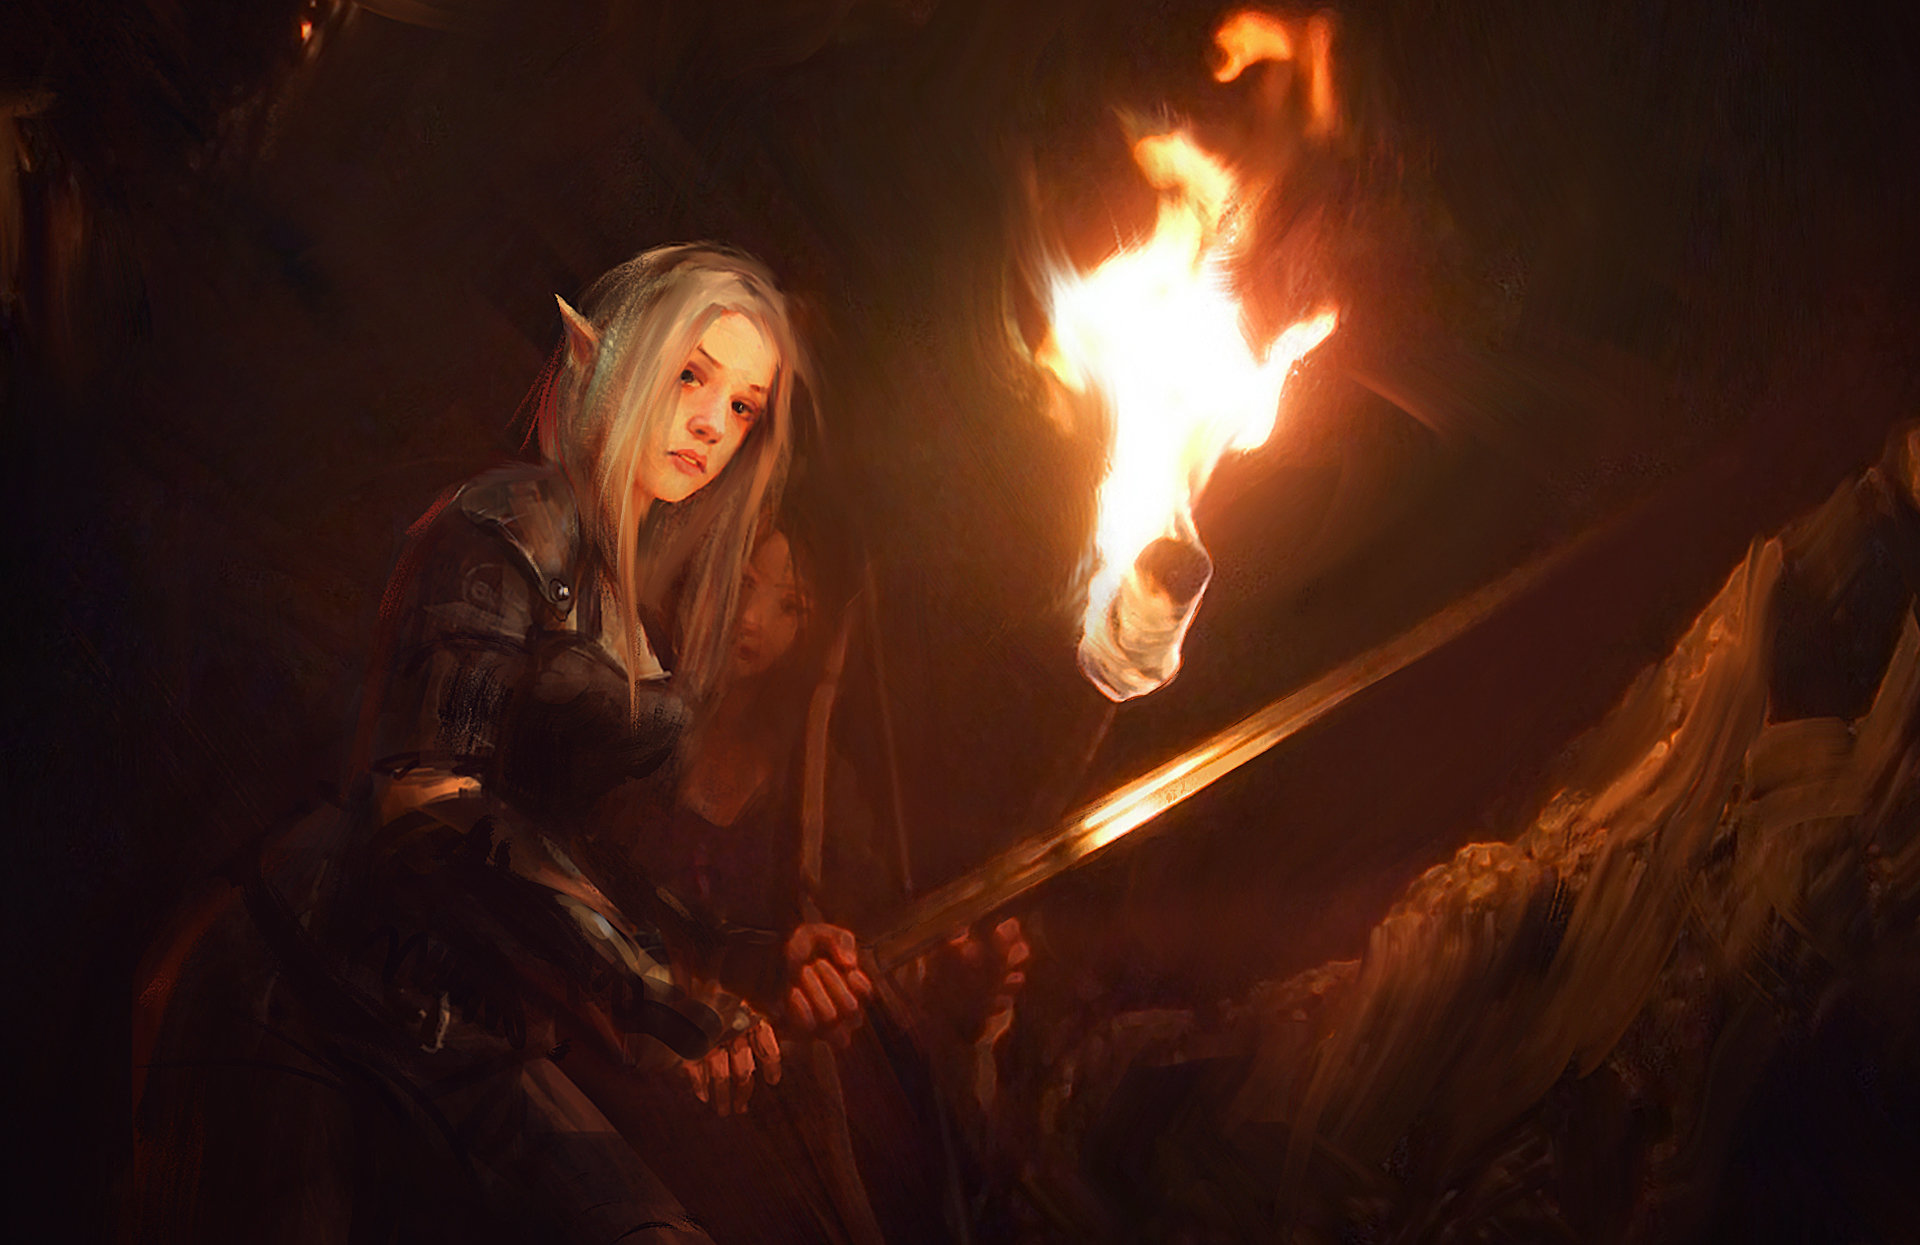 efflam-mercier-elves.jpg